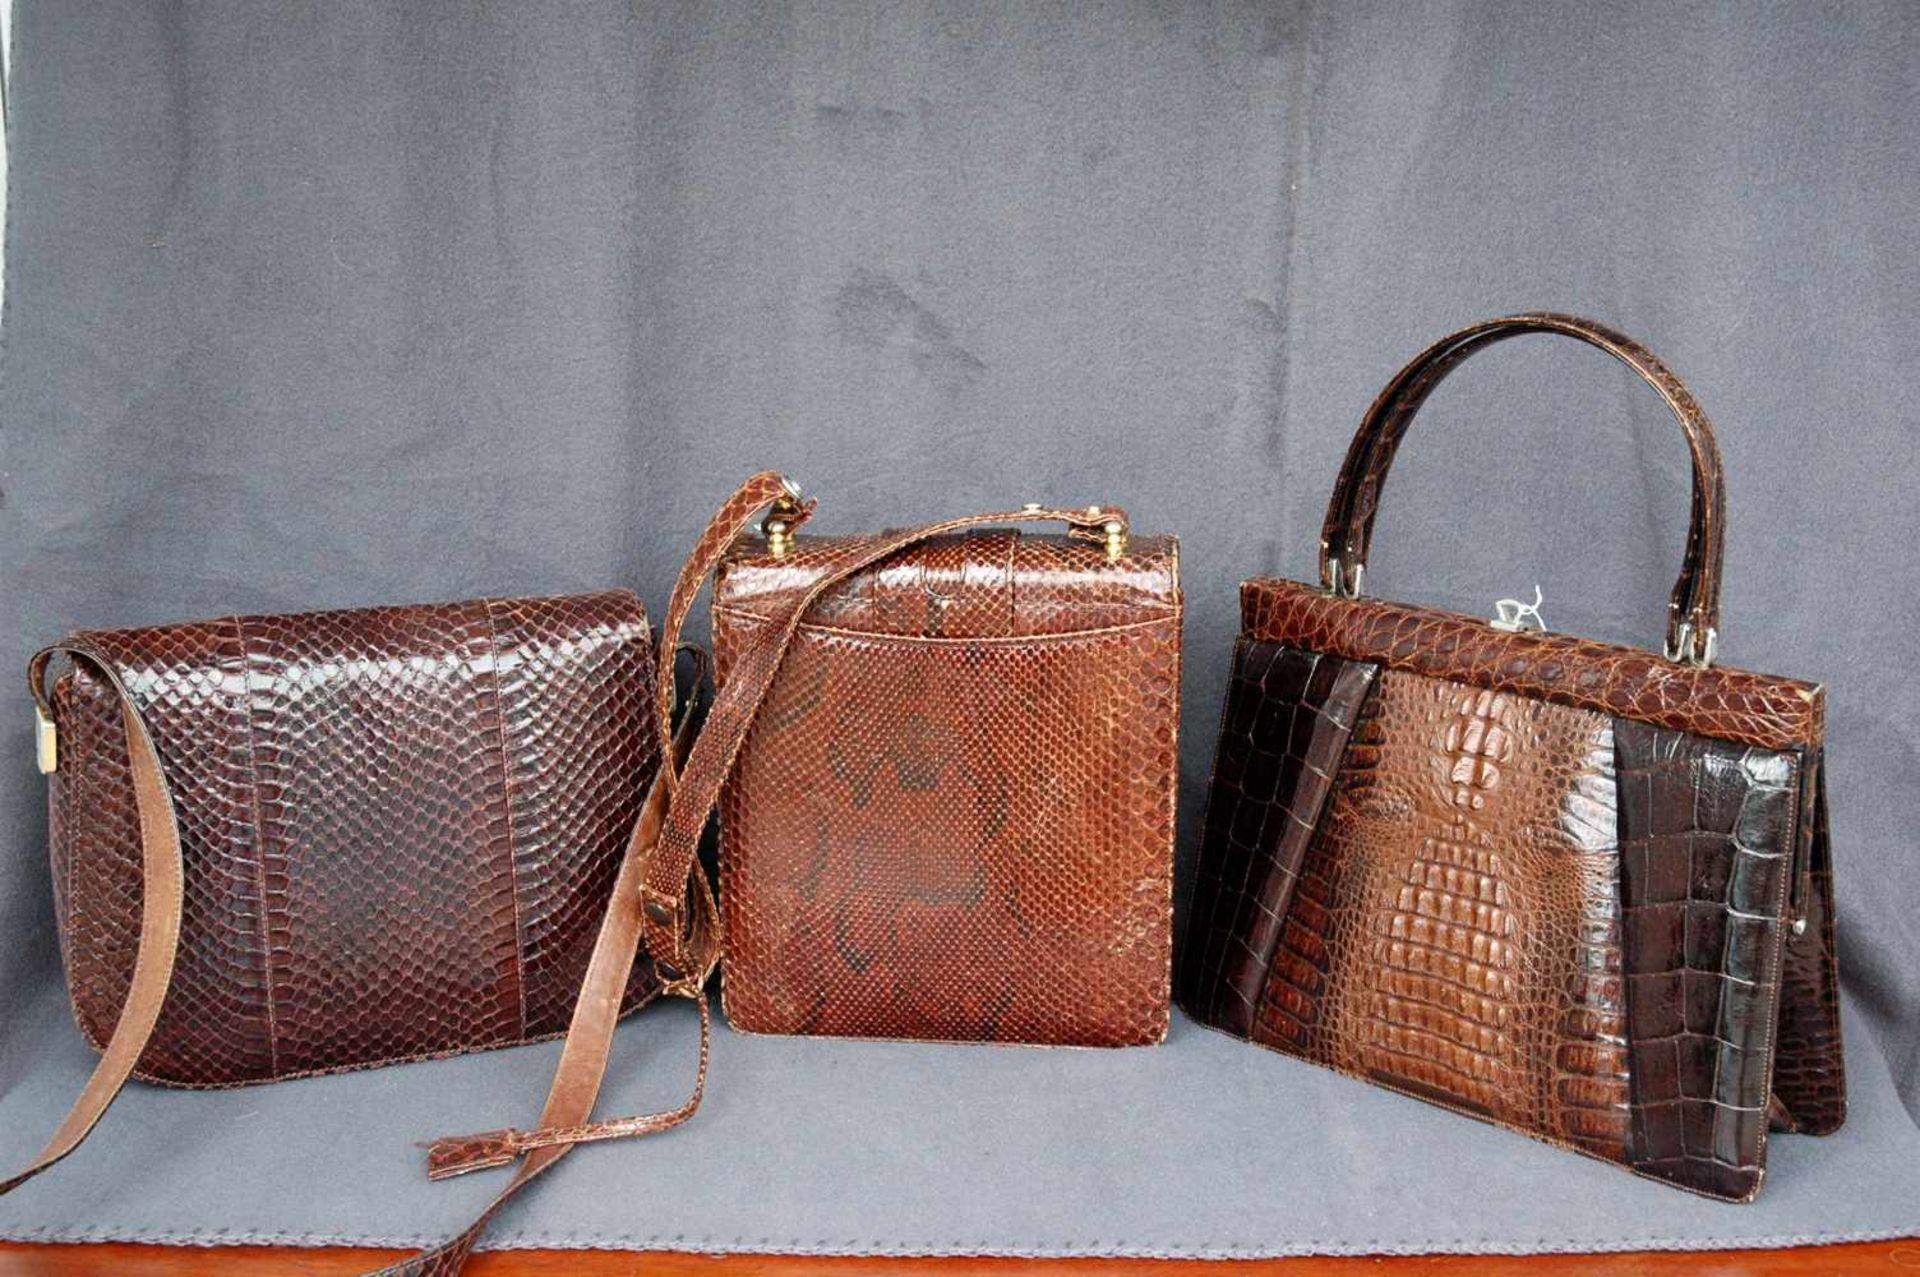 Konvolut: drei Damen-Lederhandtaschen - Bild 2 aus 2